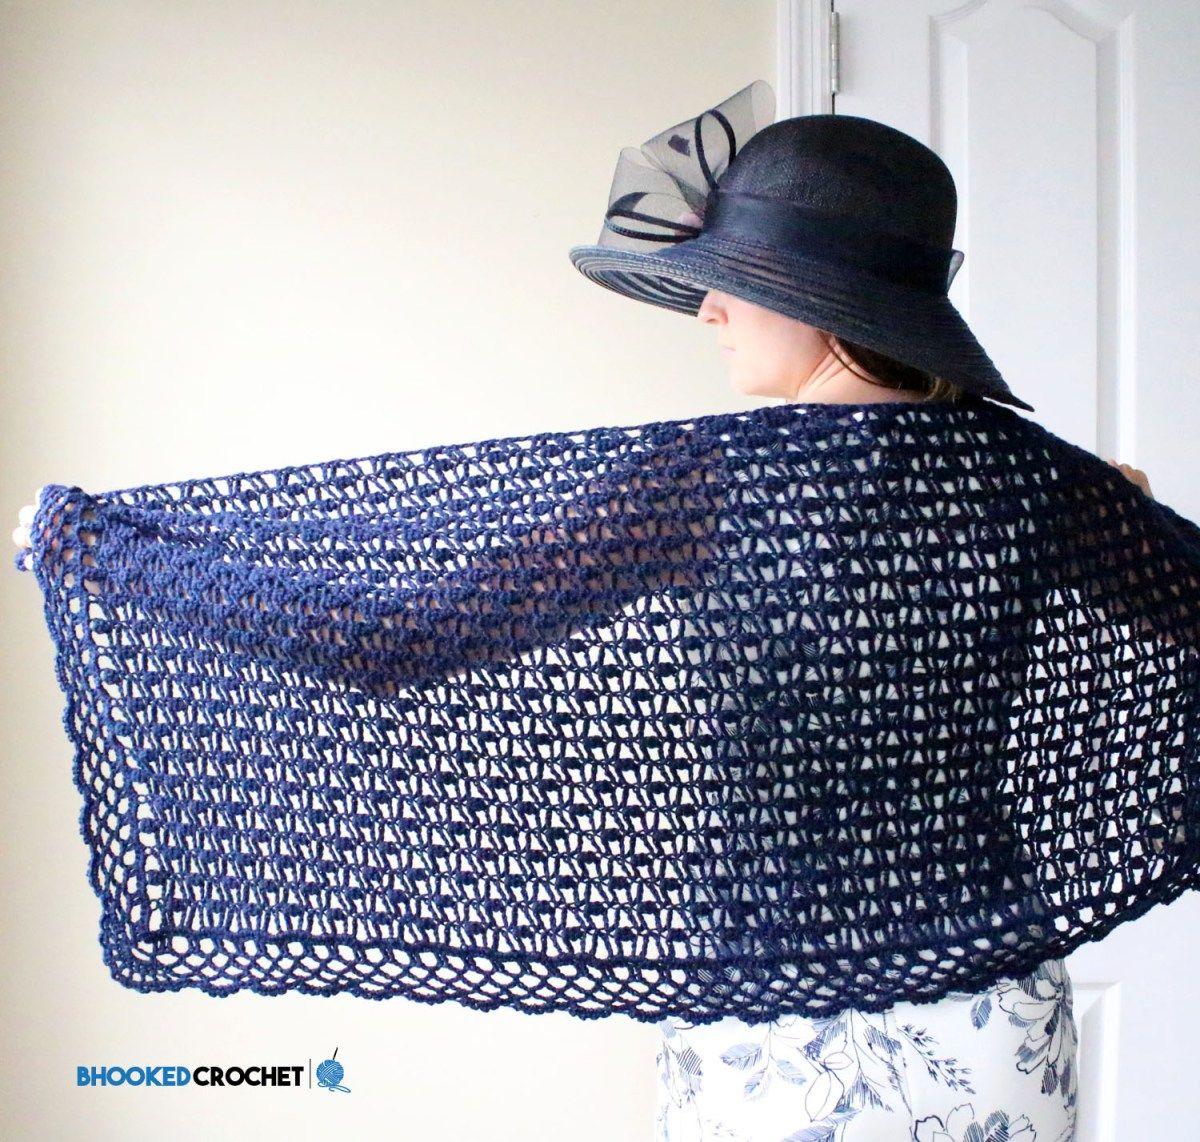 Day at the Oaks Lace Crochet Wrap - Free Pattern | Crochet shawl ...